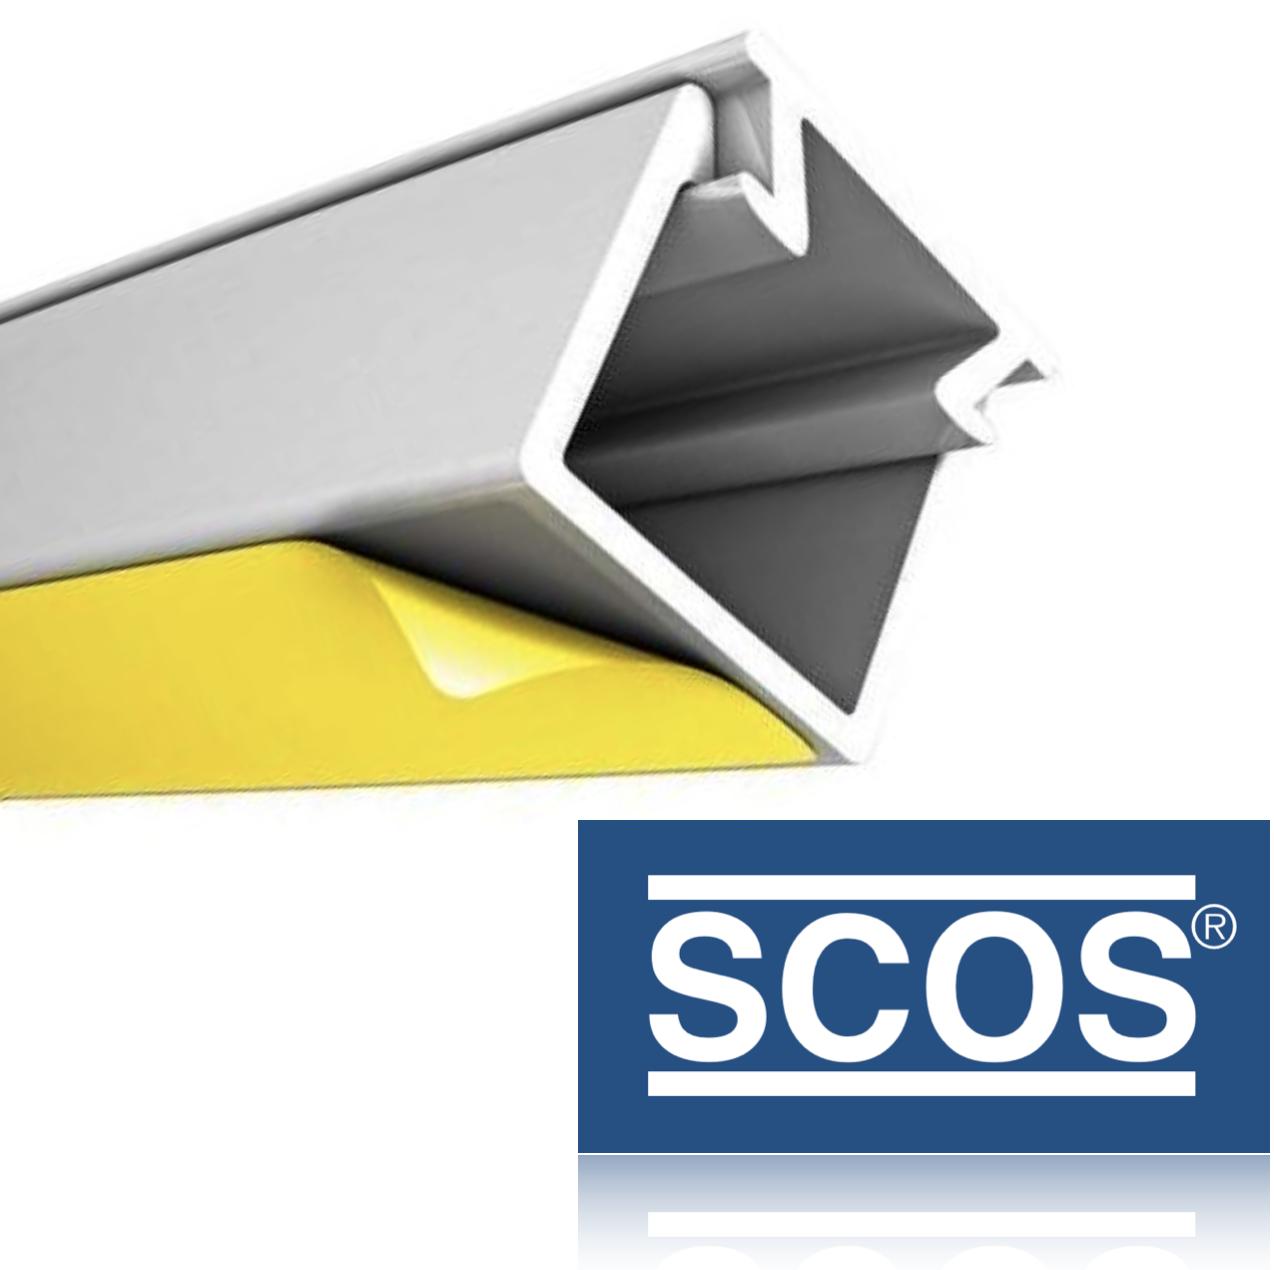 2m 80x40mm Profi Kabelkanal Schraubbar PVC SCOS® Kanal